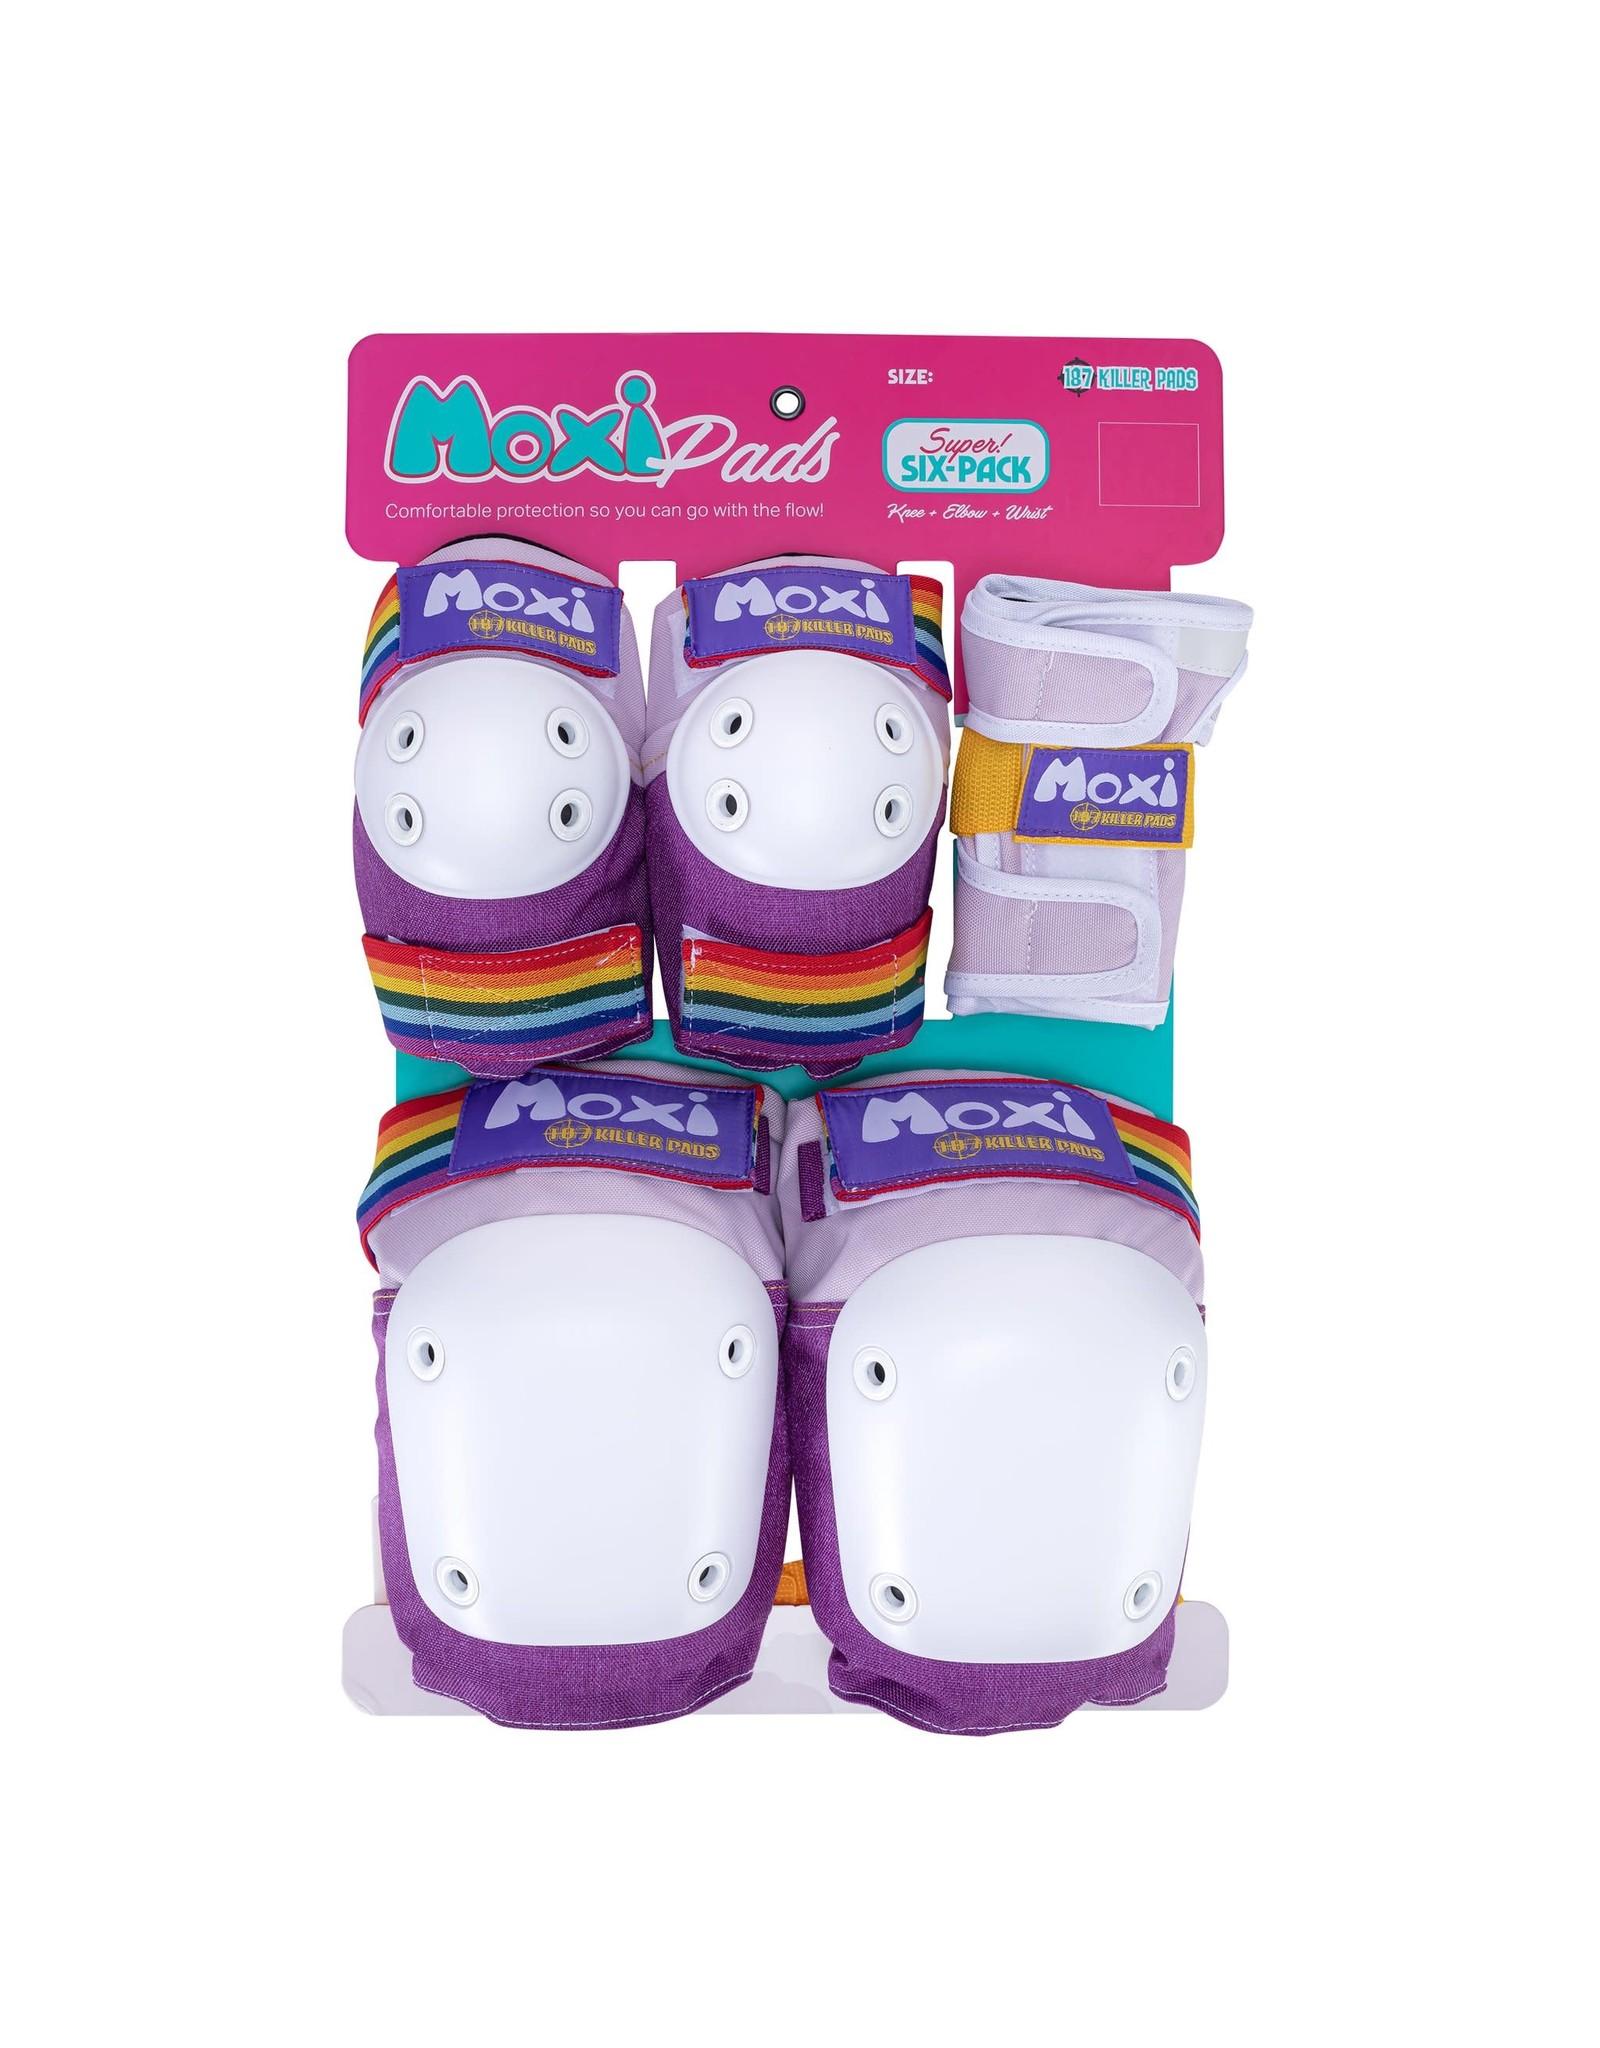 Moxi Skates Moxi Pads 6 Pack